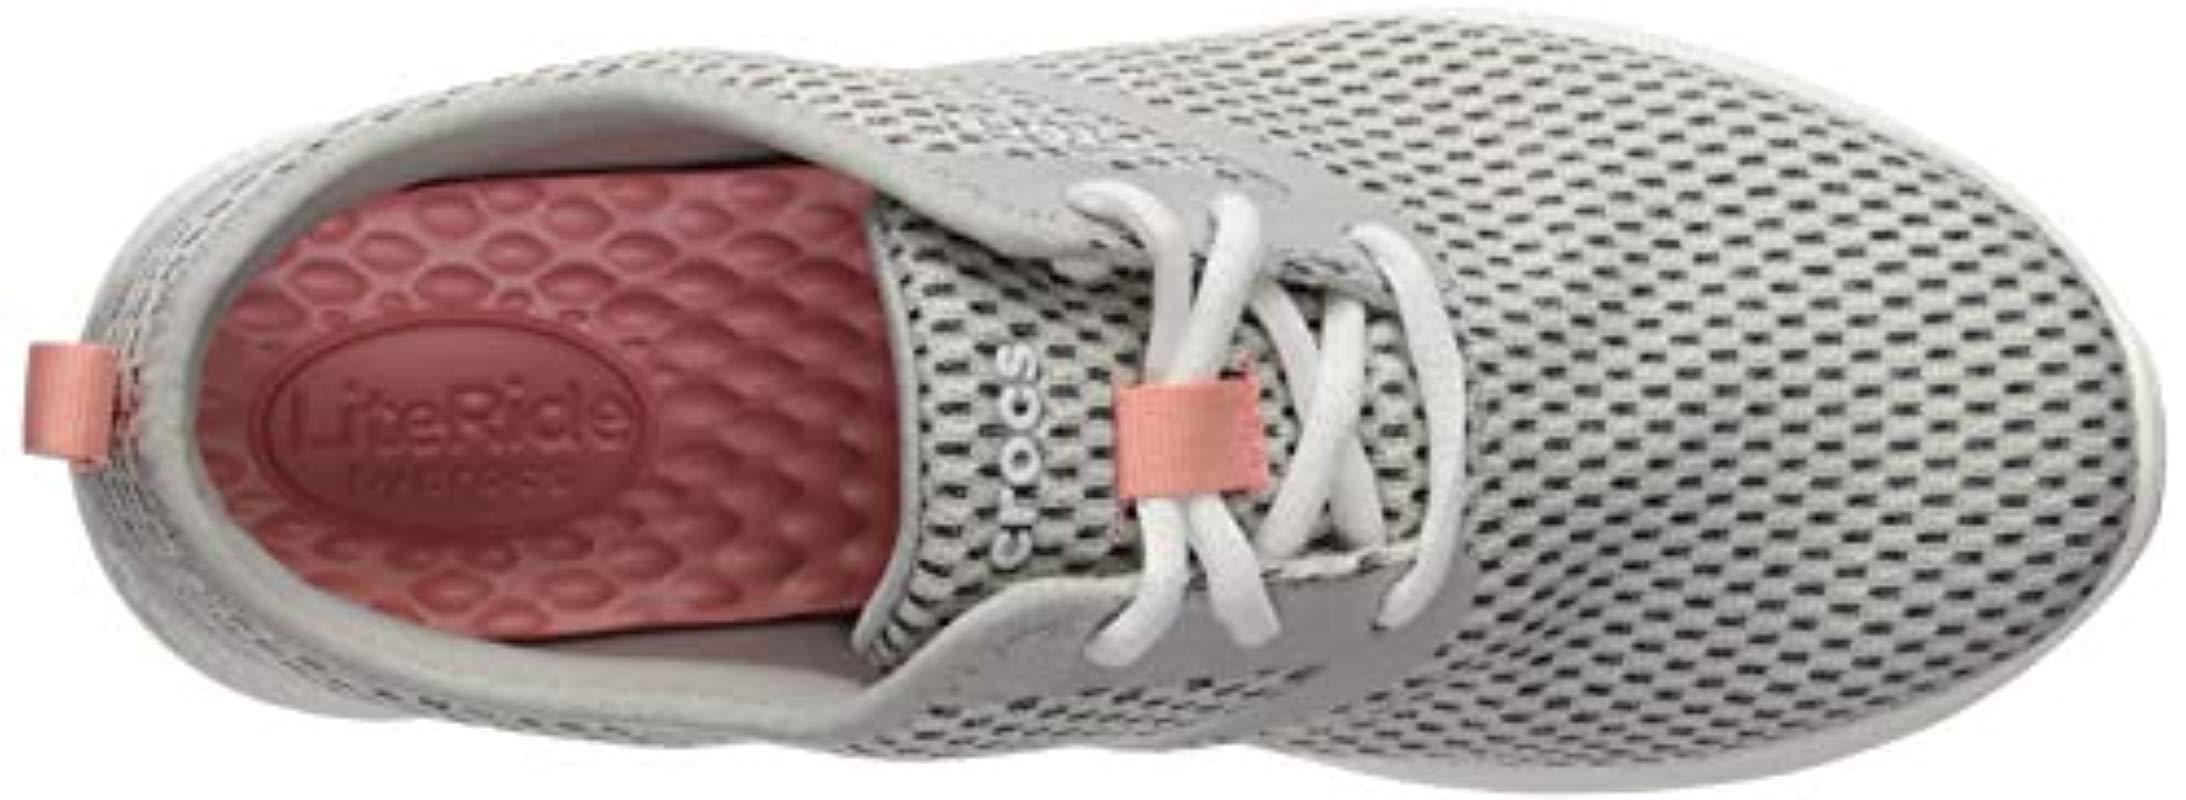 431b4795a24d Crocs™ - White Literide Mesh Lace - Lyst. View fullscreen